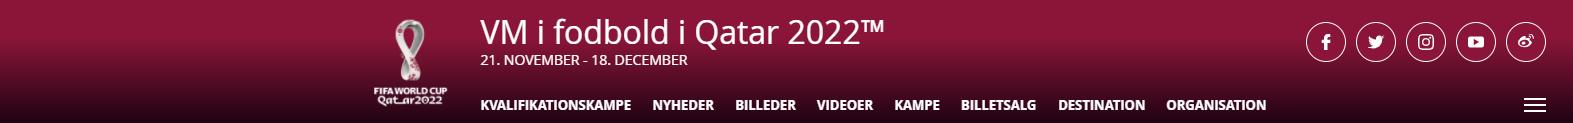 VM FOdbold 2022